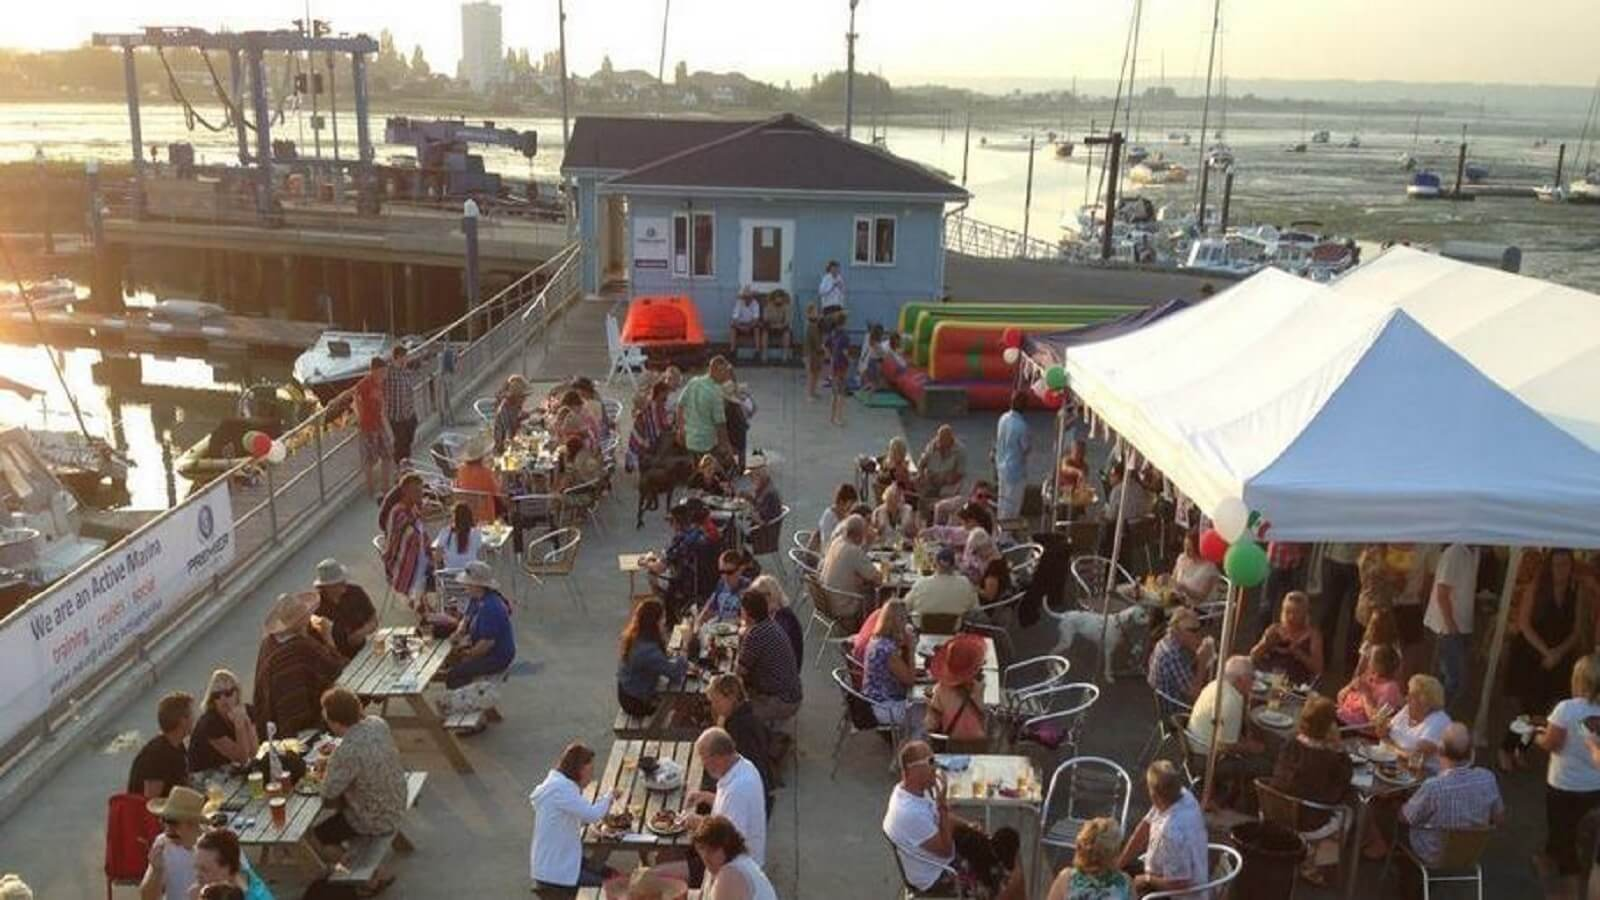 Marina Bar & Cafe